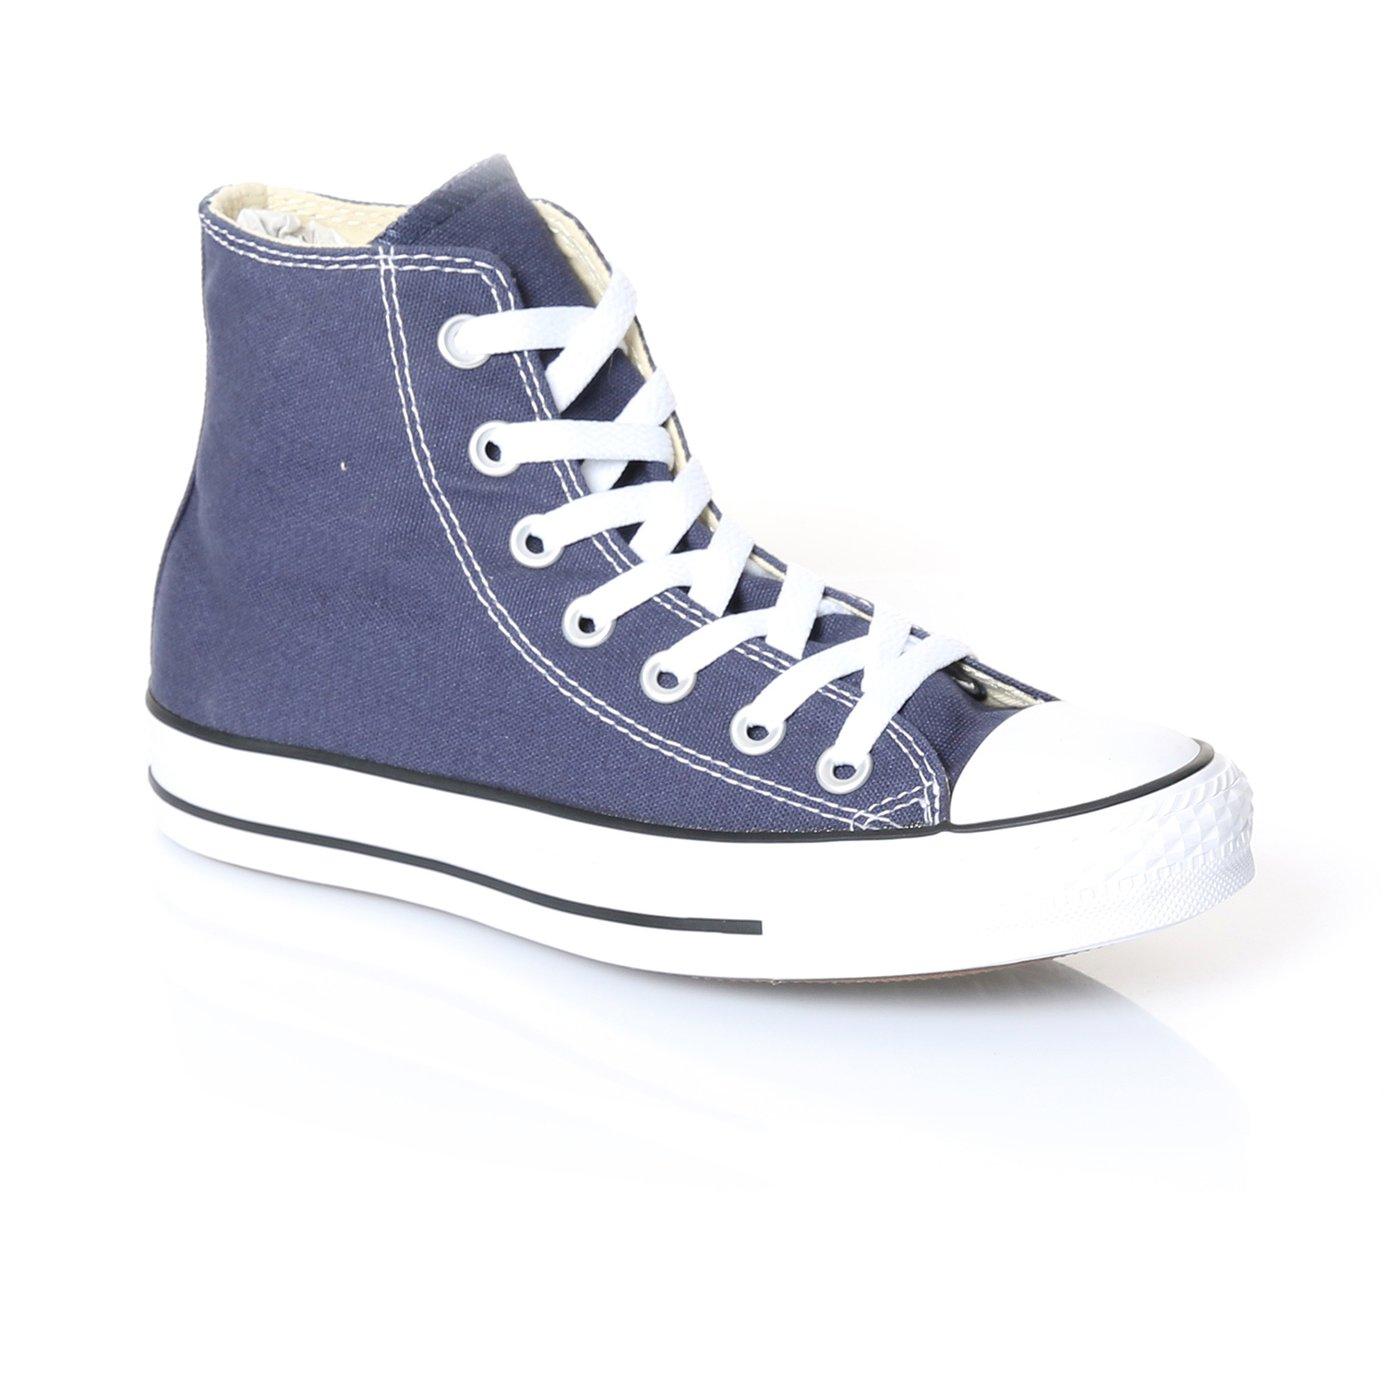 Converse Chuck Taylor All Star Mid Unisex Lacivert Sneaker